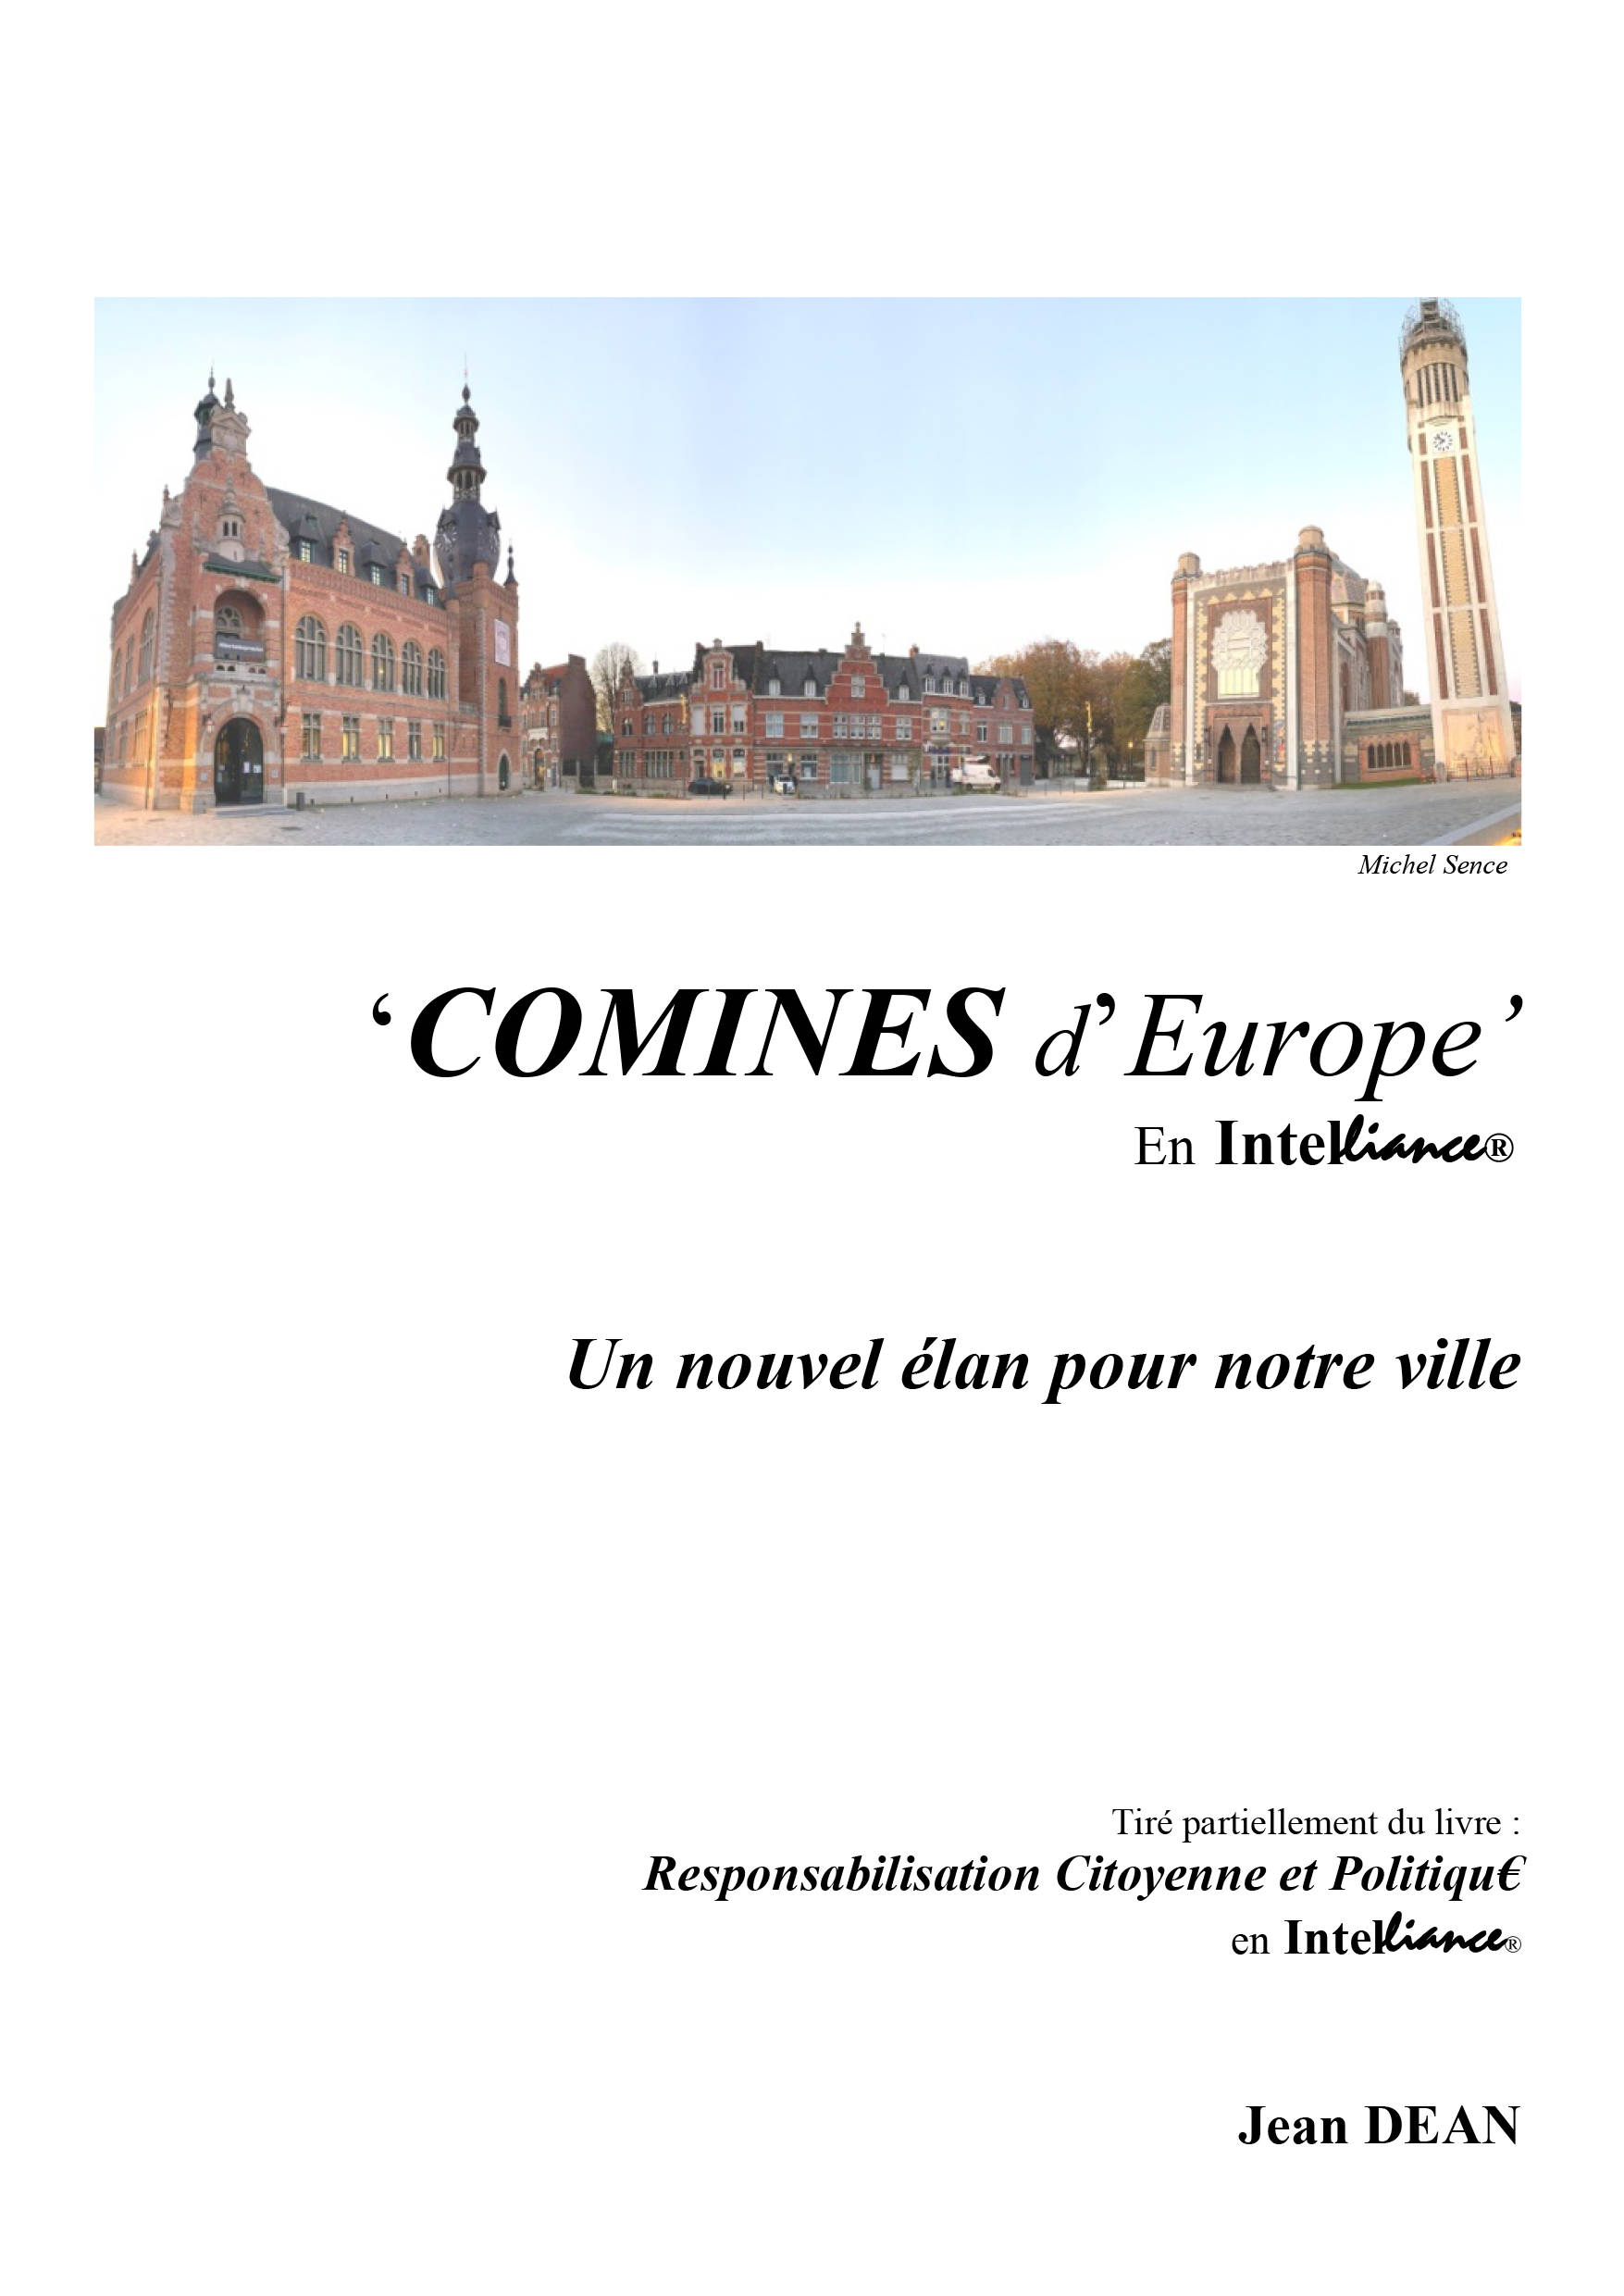 COMINES d'EUROPE en Intelliance